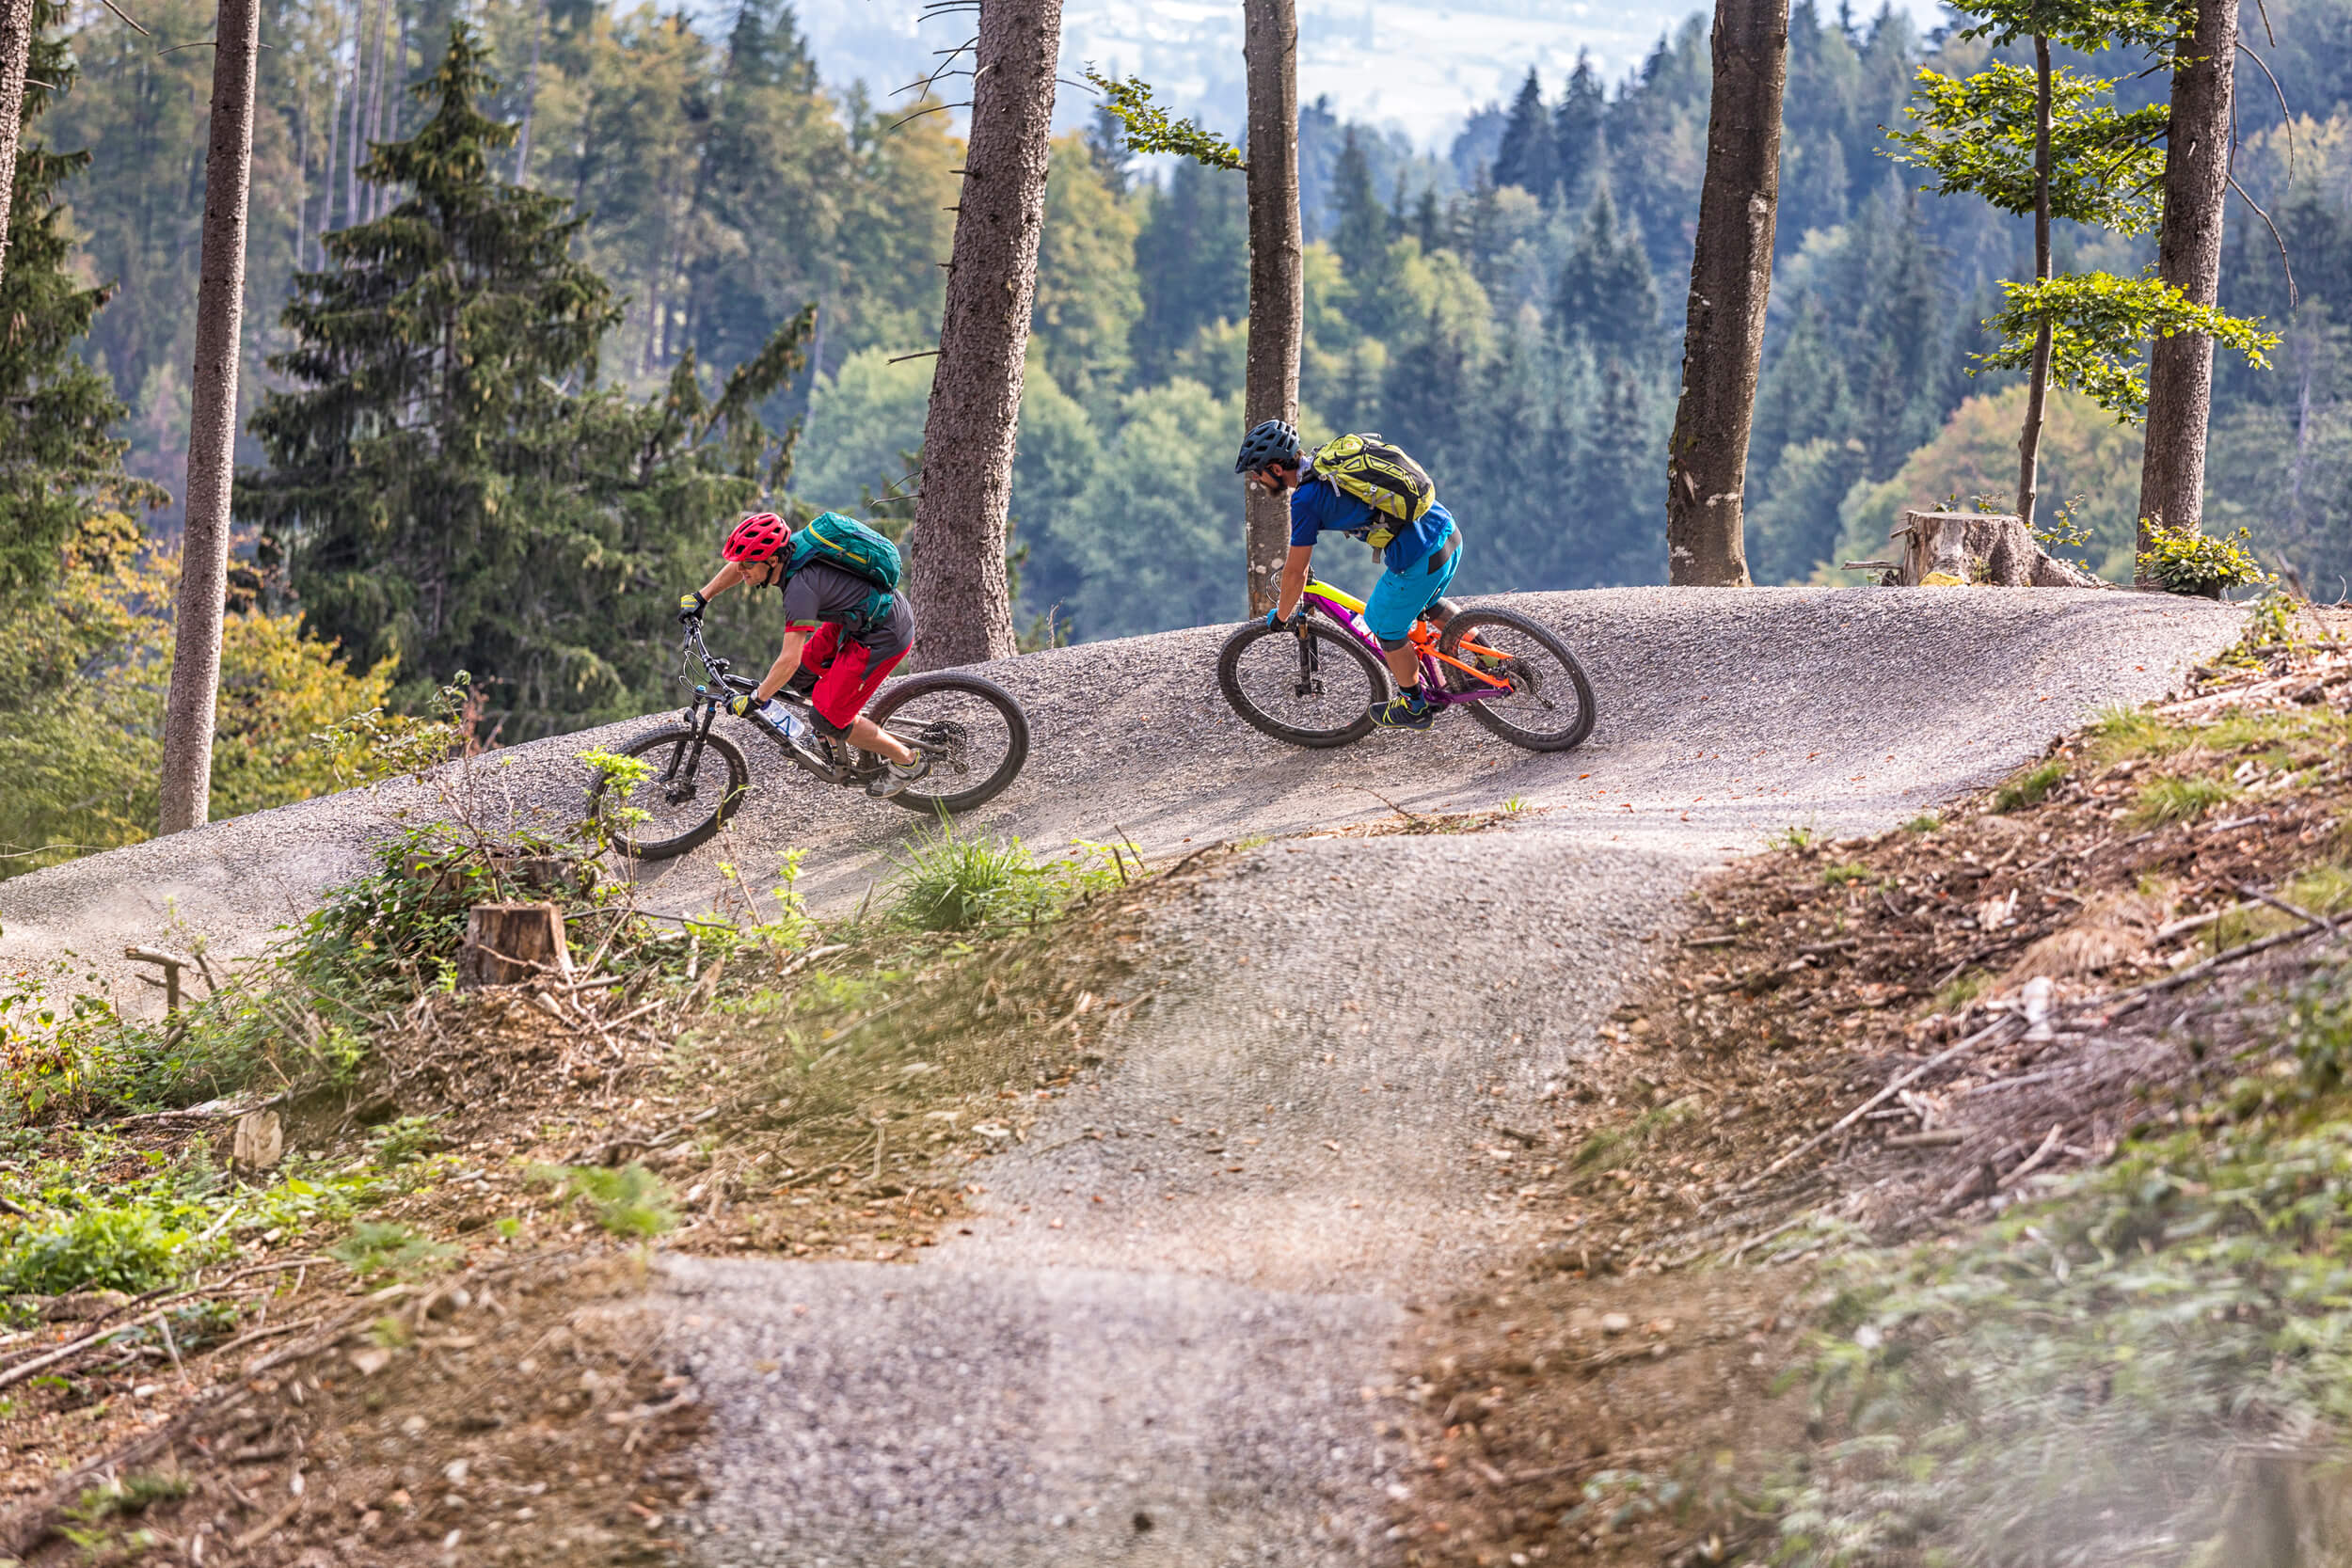 Mex Line 1 Signature Trail in Kärnten © WOM Medien